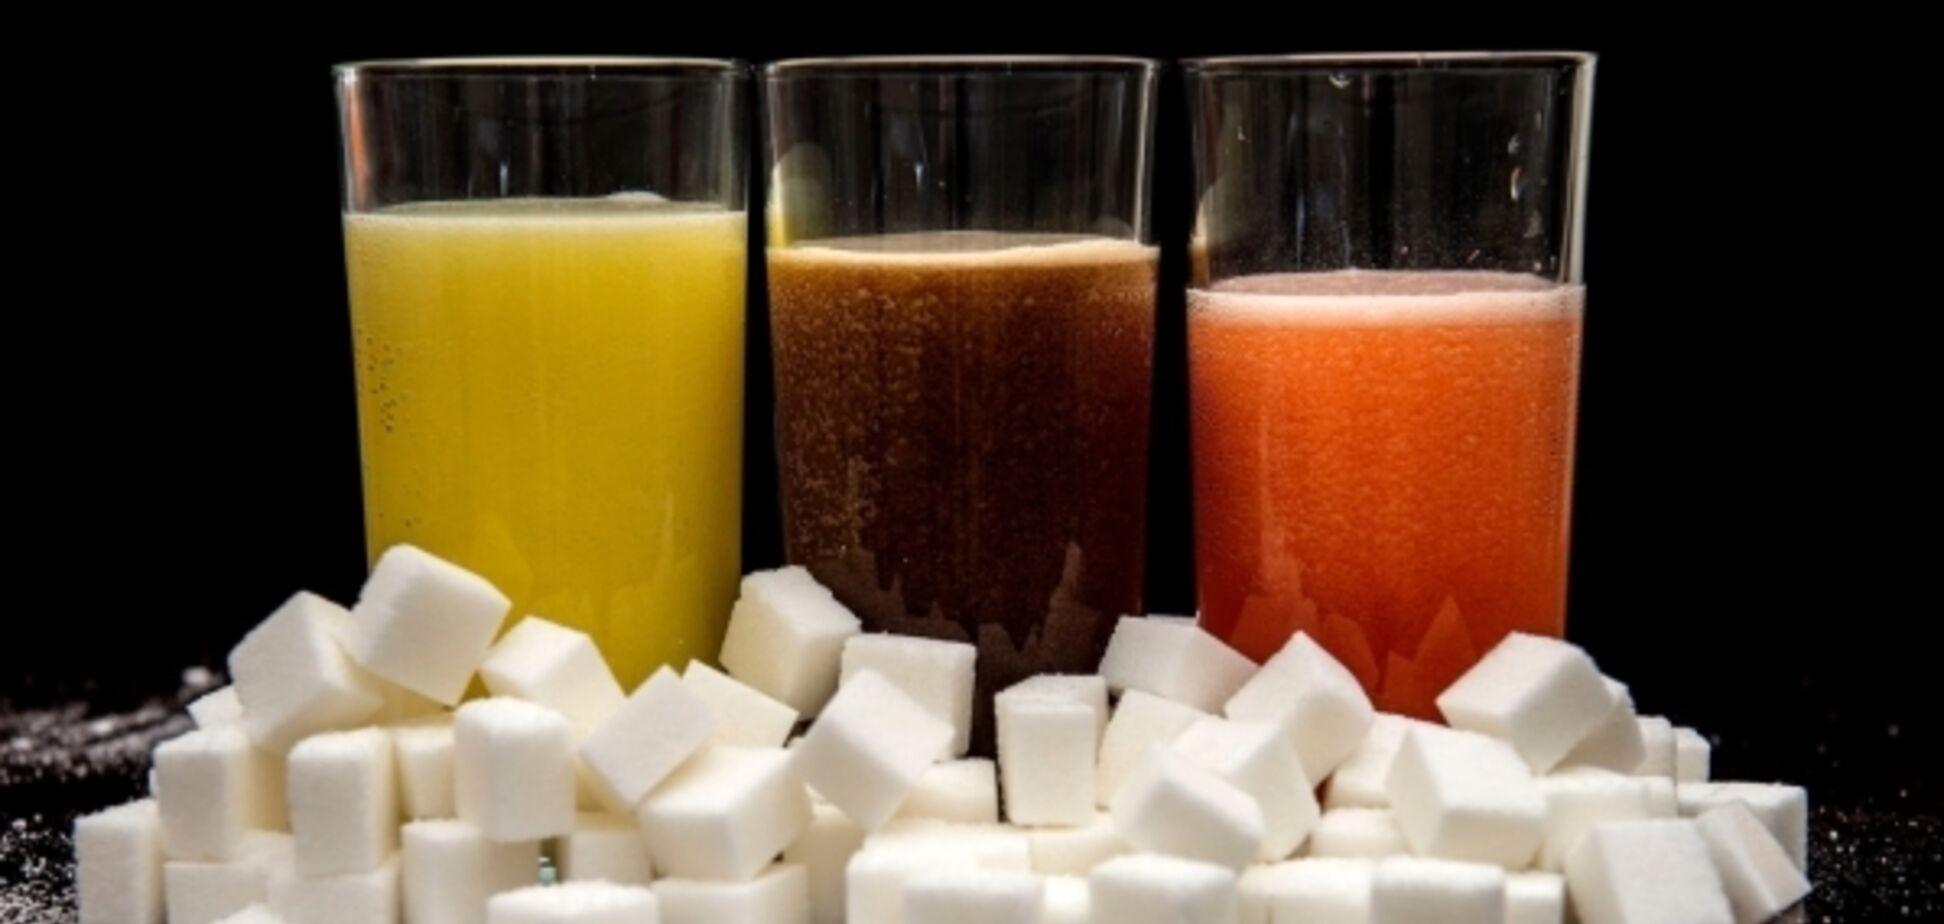 Супрун назвала небезпеку солодких напоїв